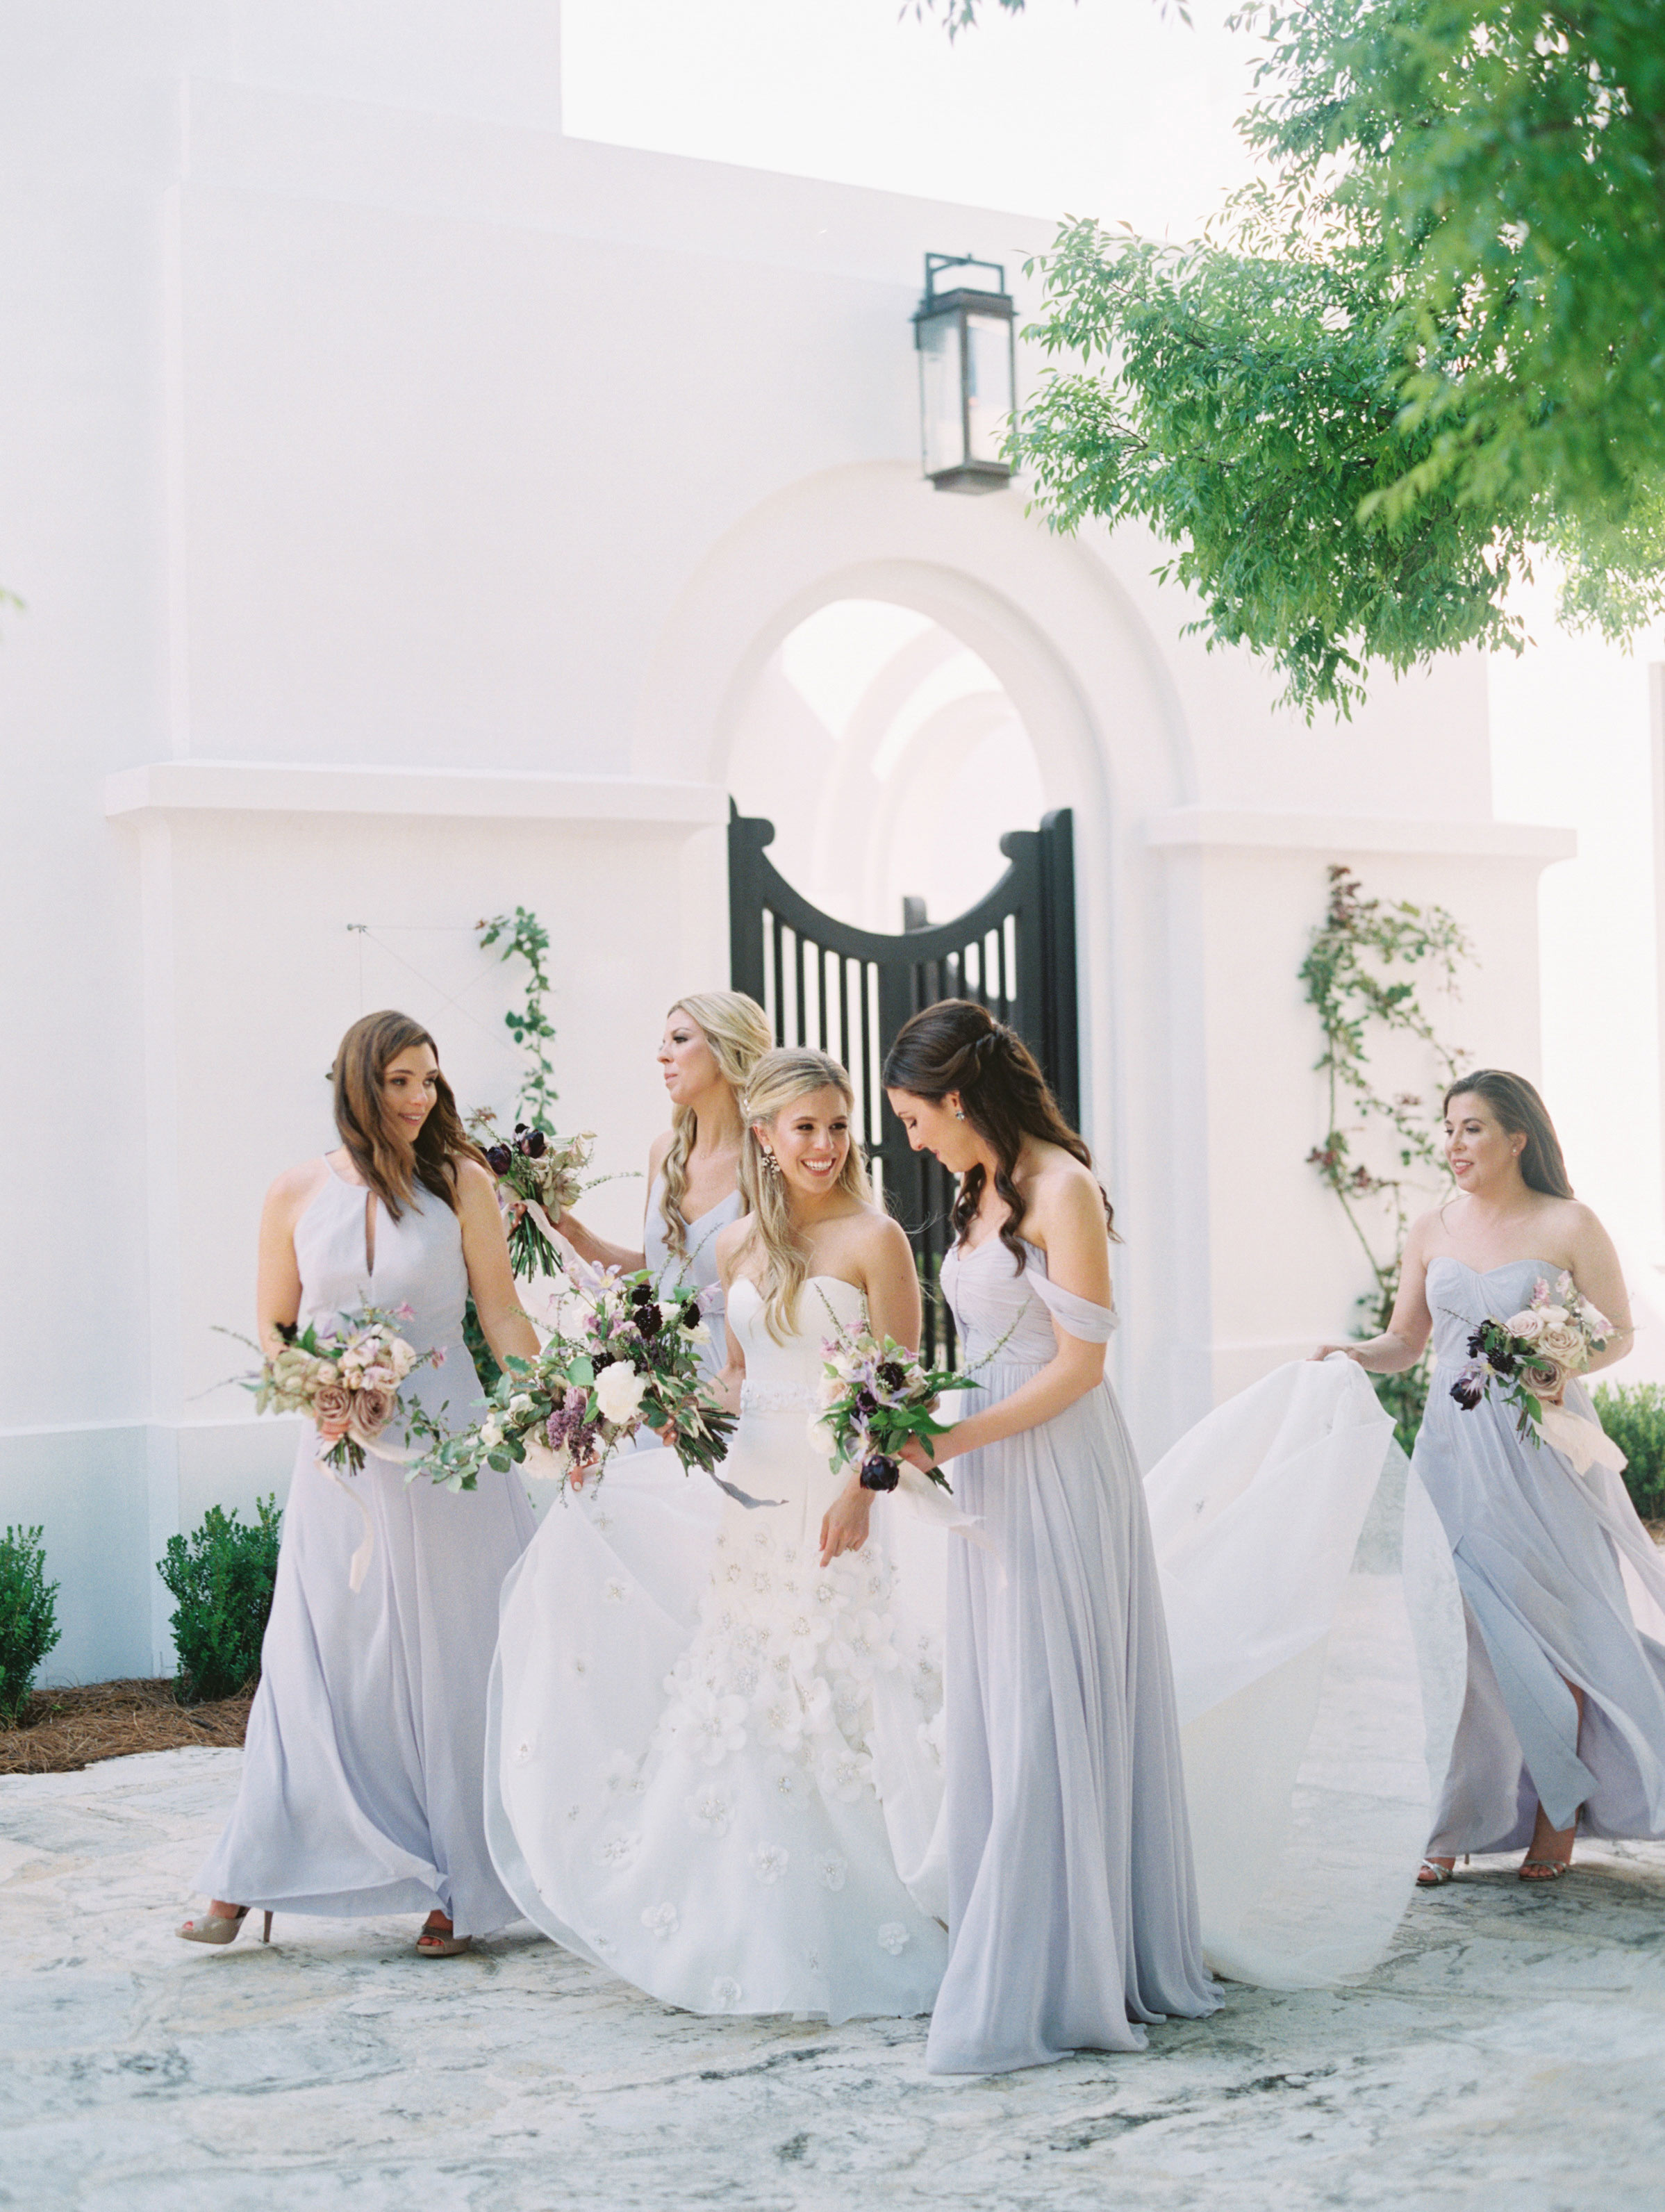 leighton craig wedding bridesmaids assembling in courtyard